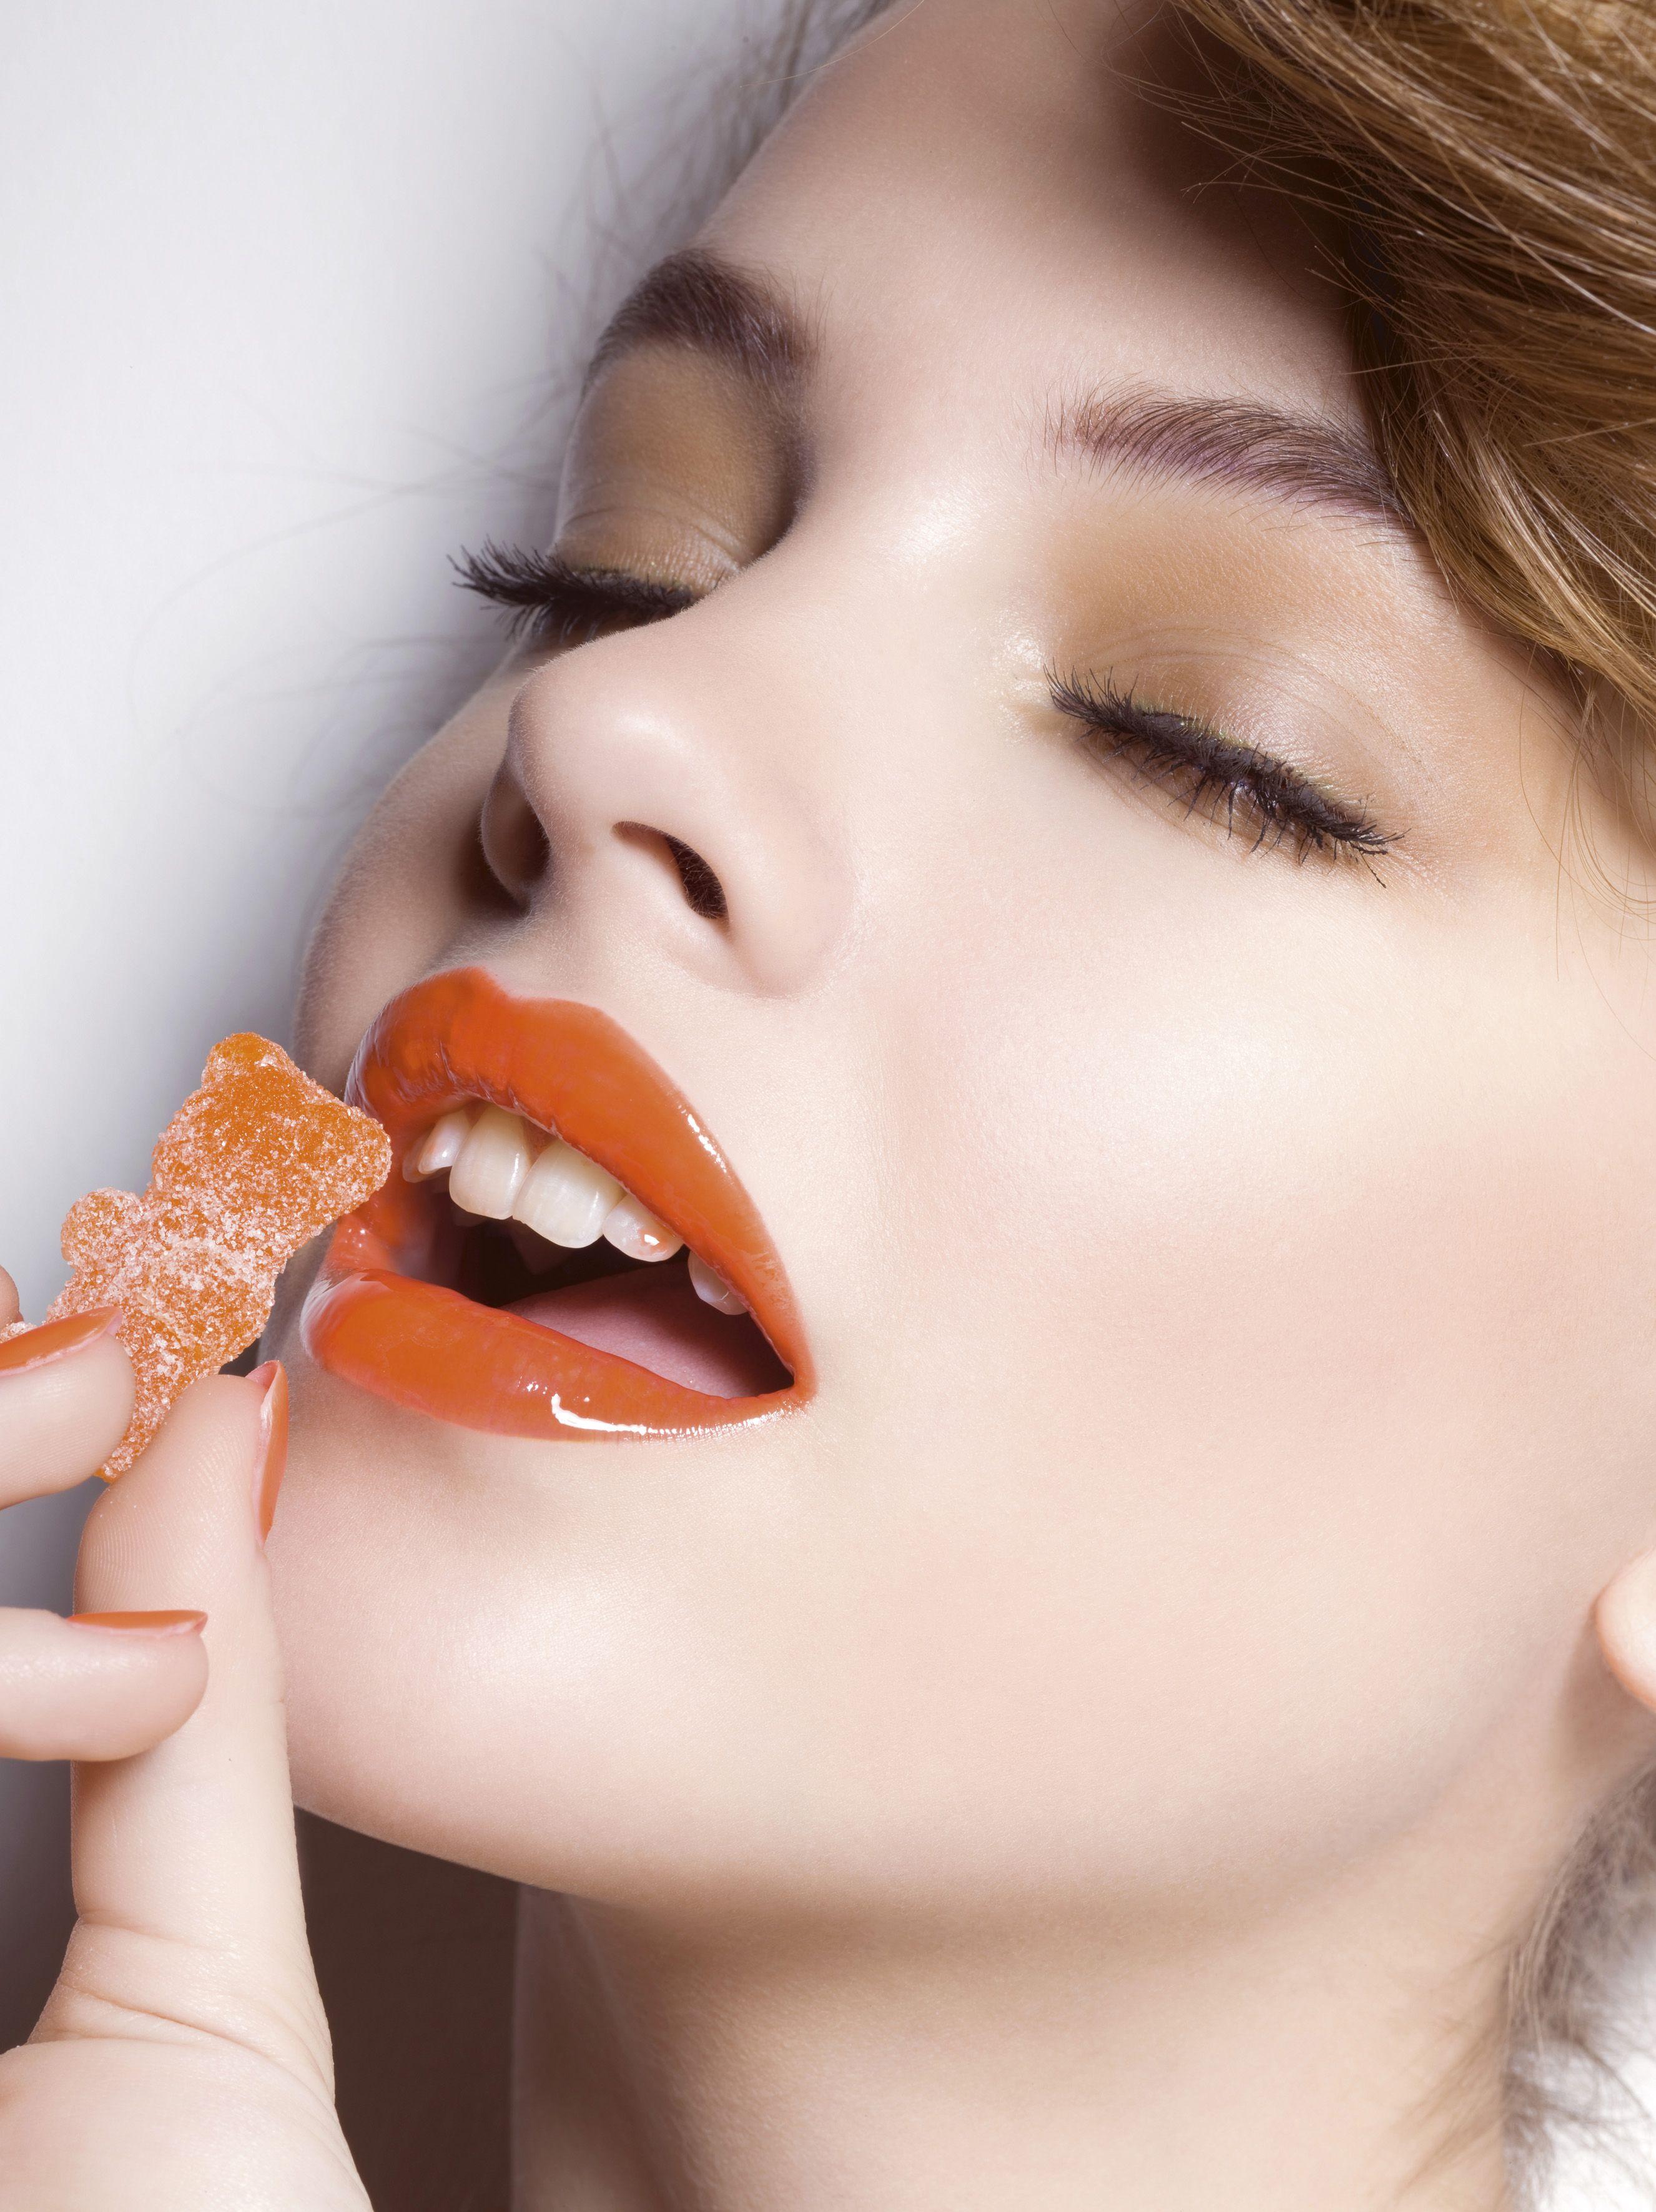 Labios naranjas, la tendencia obligada esta primavera. #beauty #lips